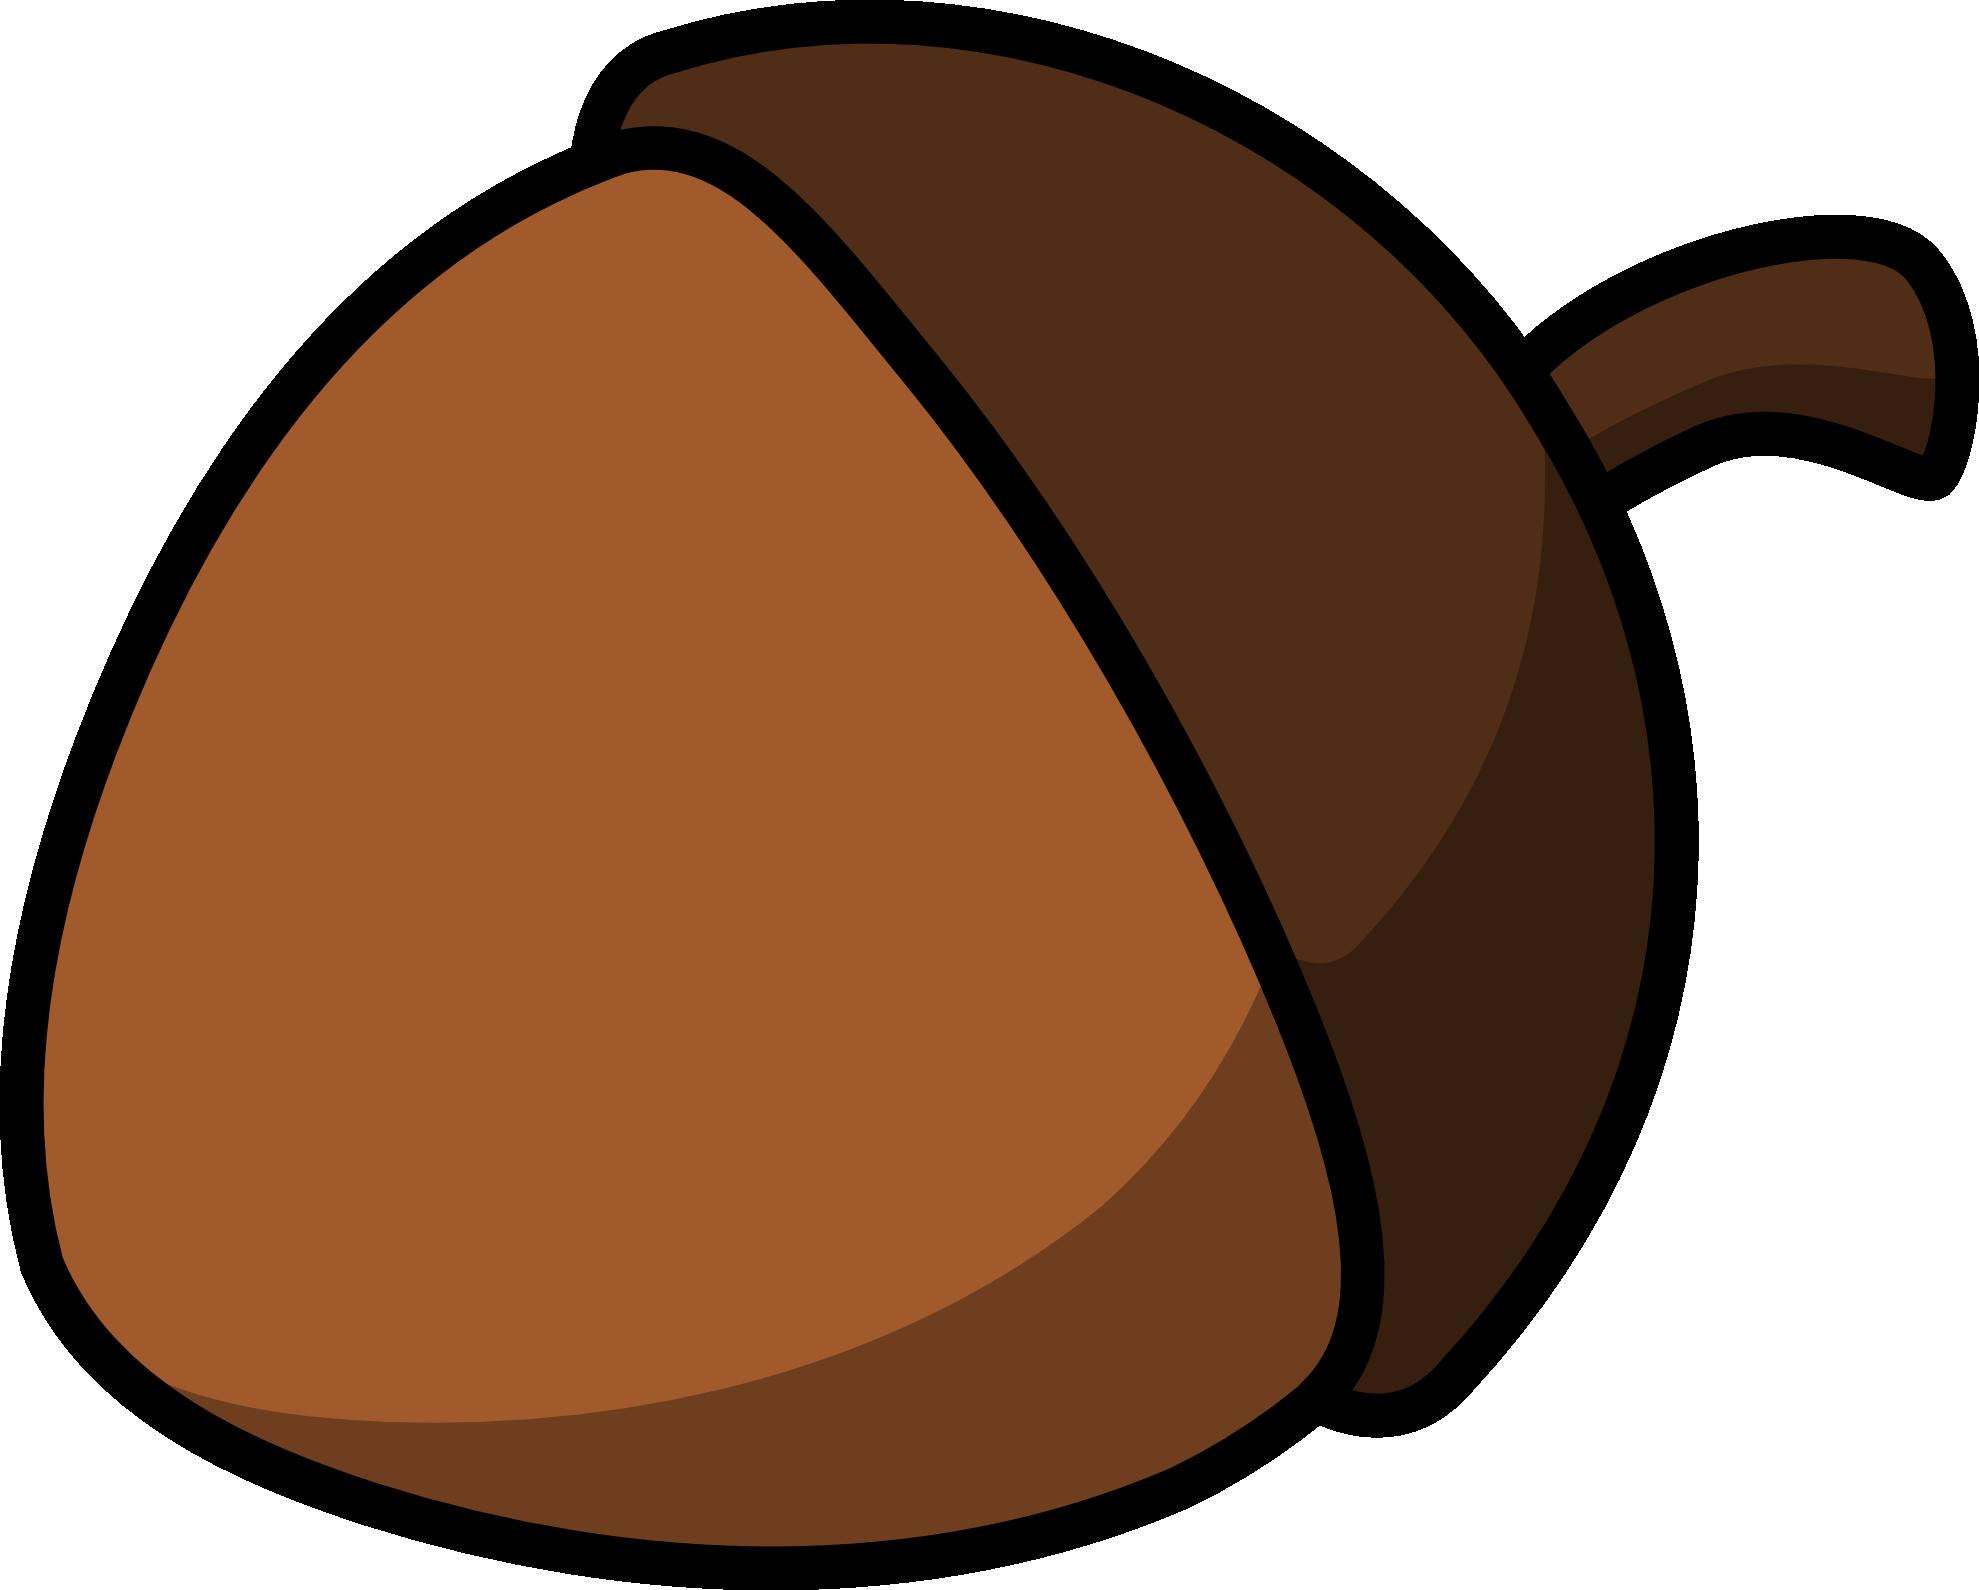 Clipart food nuts. Acorn panda free images